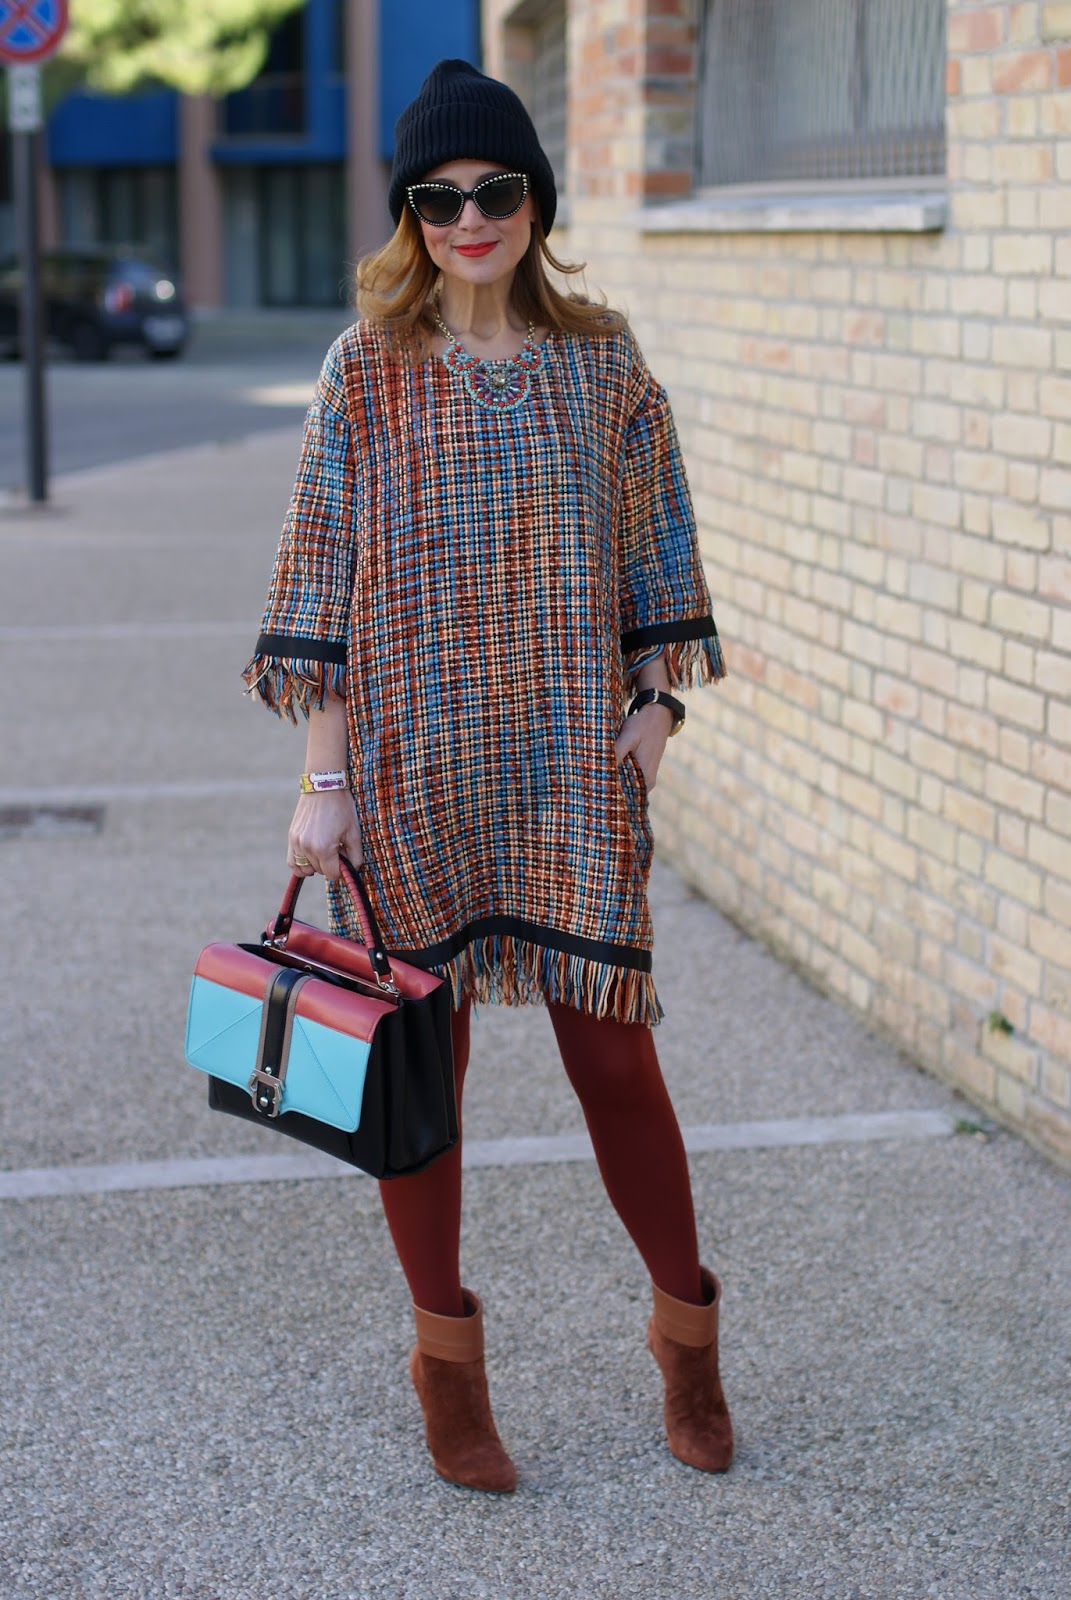 Vogos Gigi dress, Le Silla stivaletti and Paula Cademartori Faye bag on Fashion and Cookies fashion blog, fashion blogger style